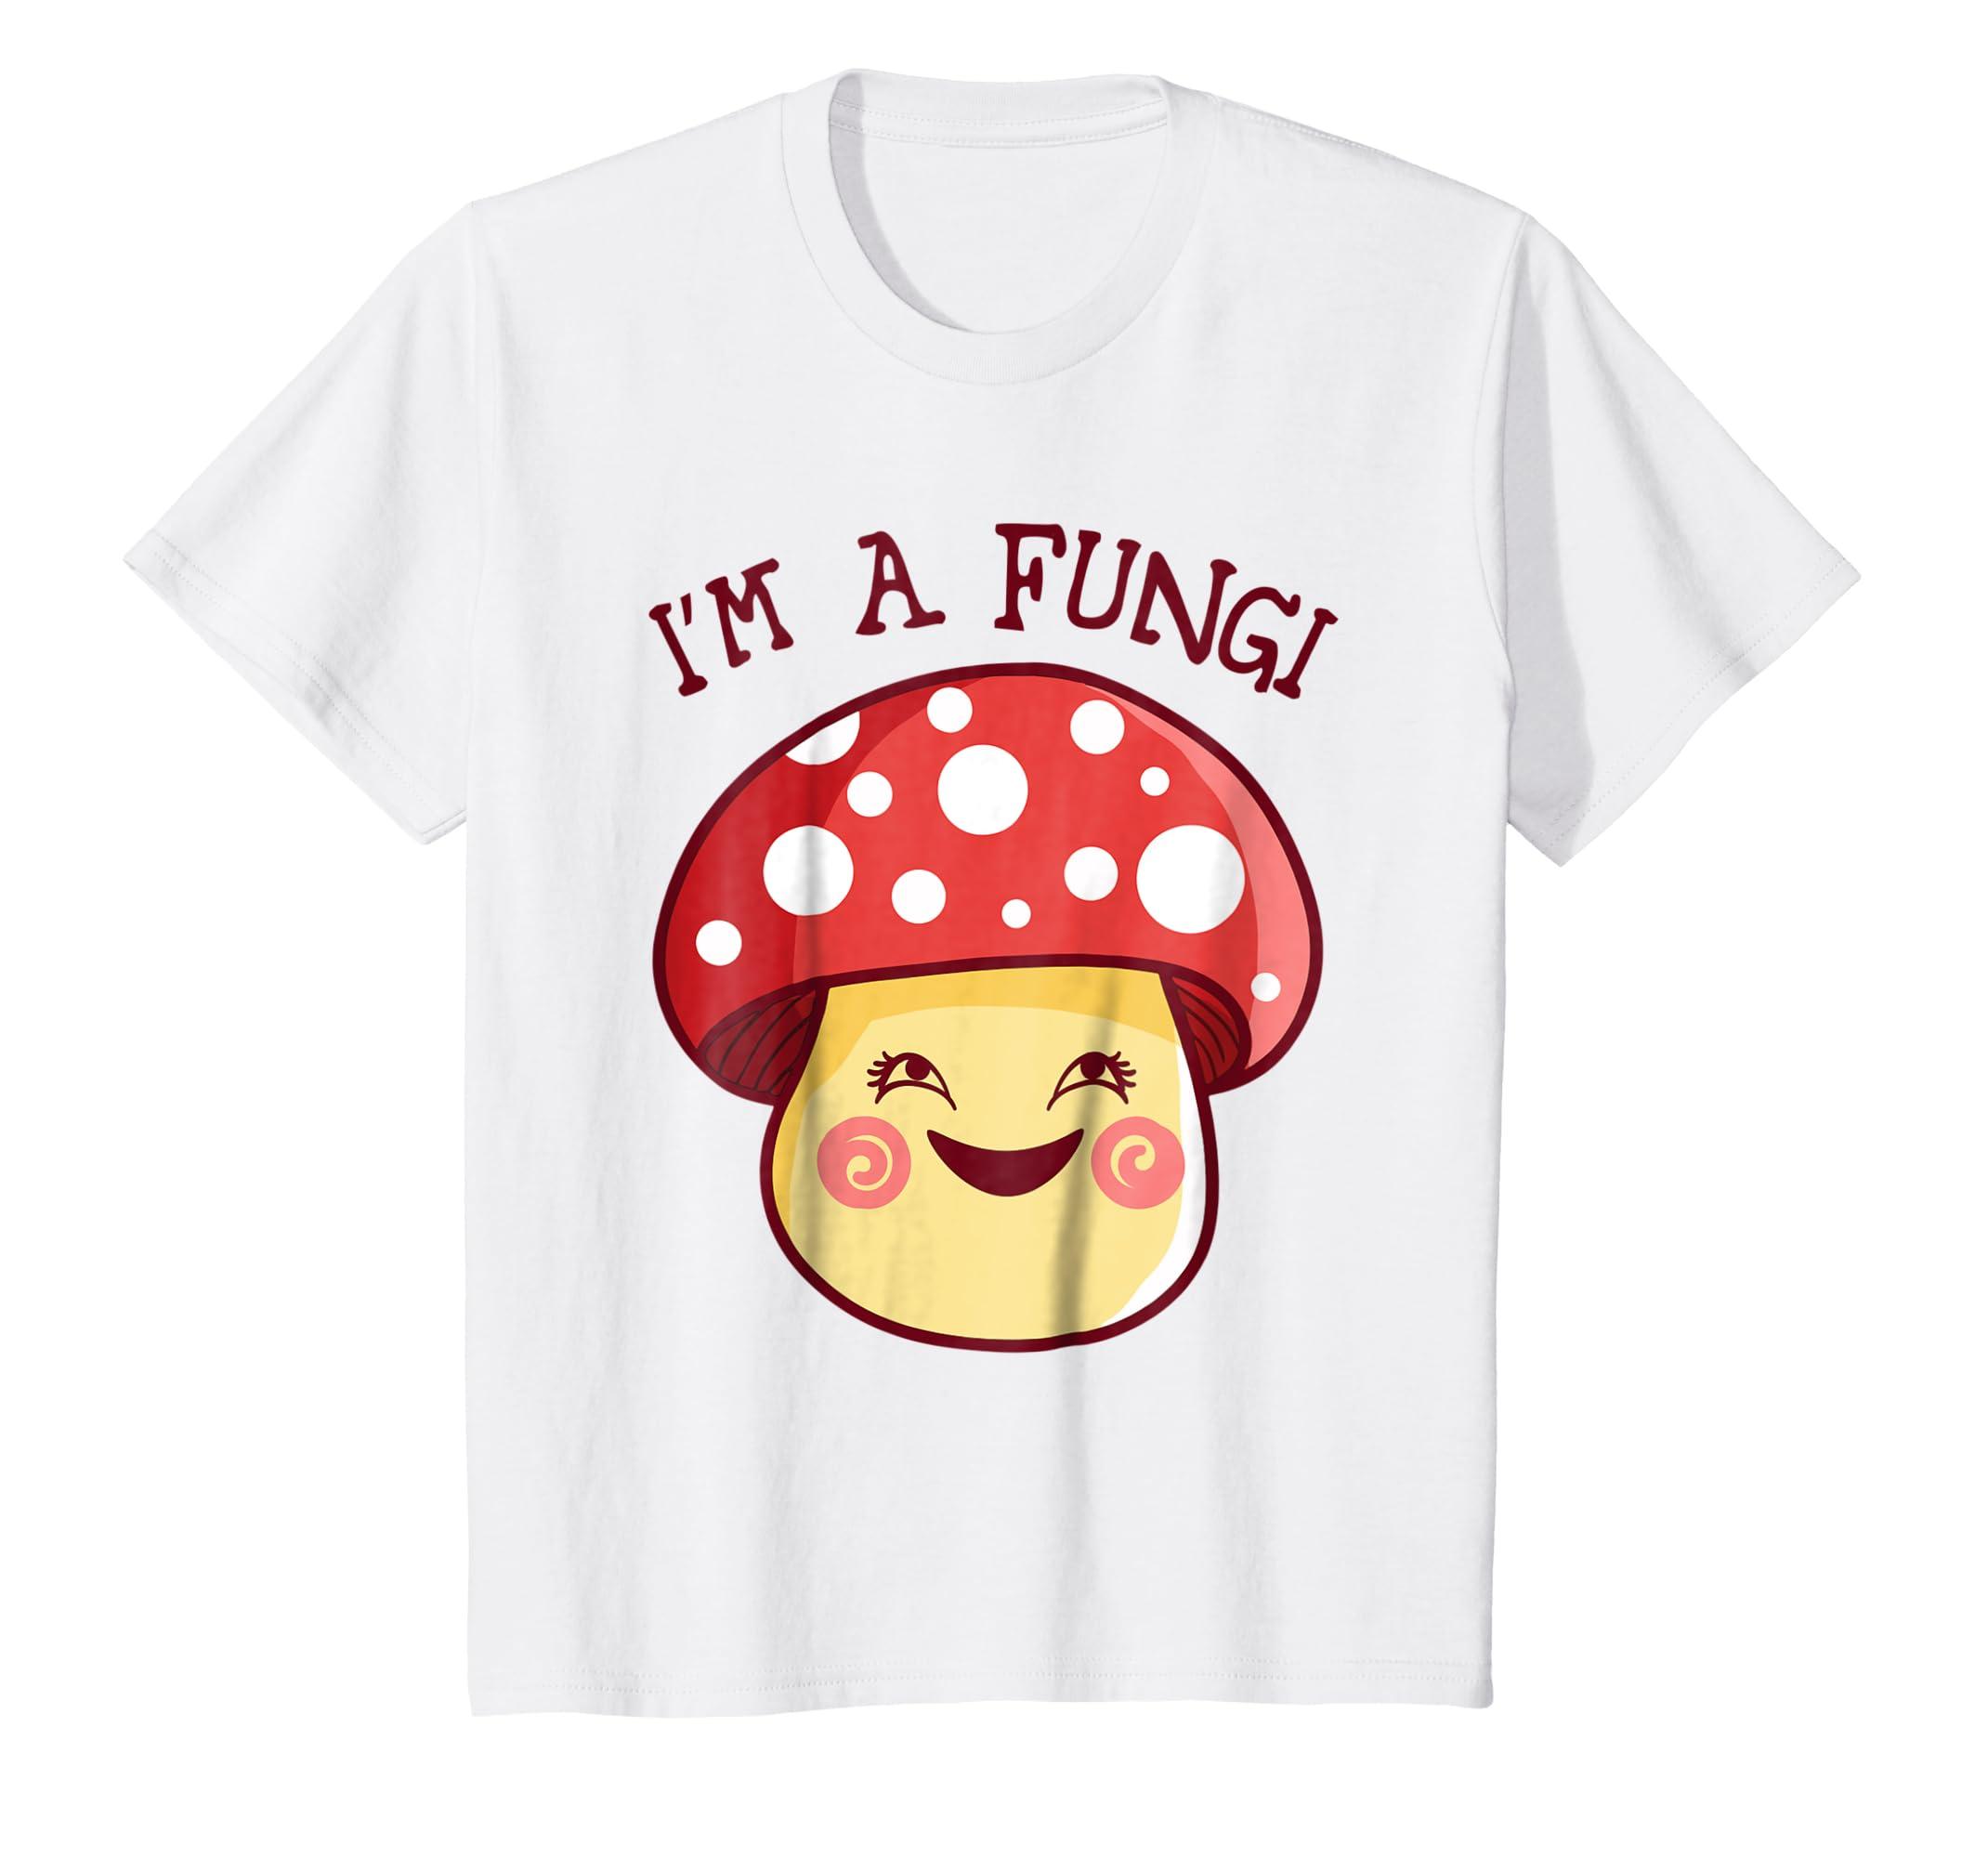 94c9bfd6 Amazon.com: I'm a Fungi T Shirt Mushroom Fun Guy Pun Funny Party Shirt:  Clothing